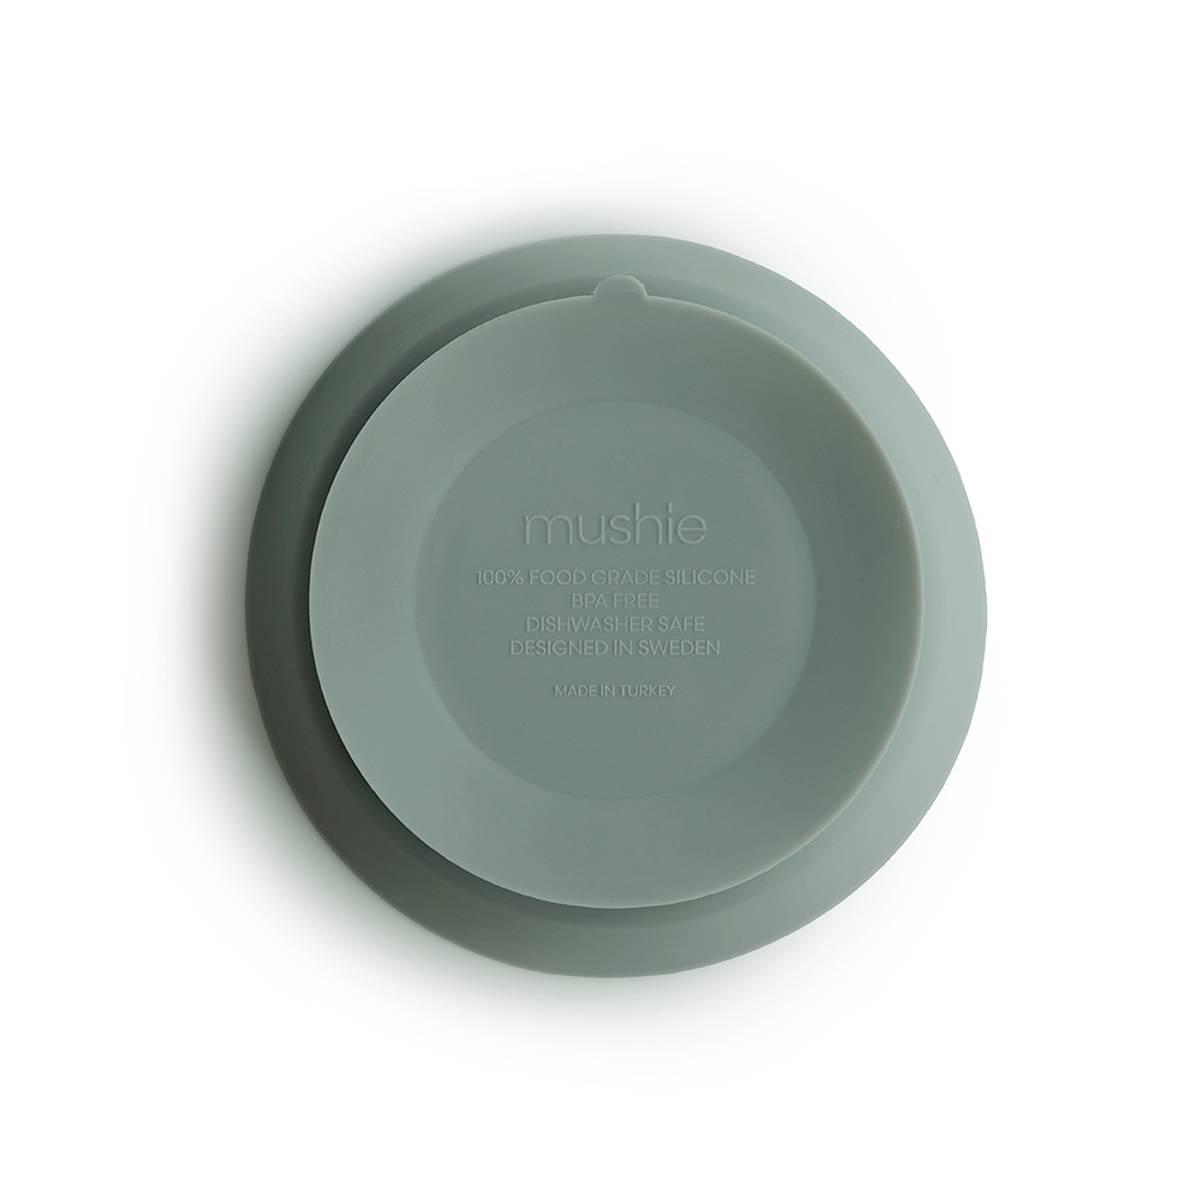 Skål - Silikon med Sugefunksjon - Mushie - Sage